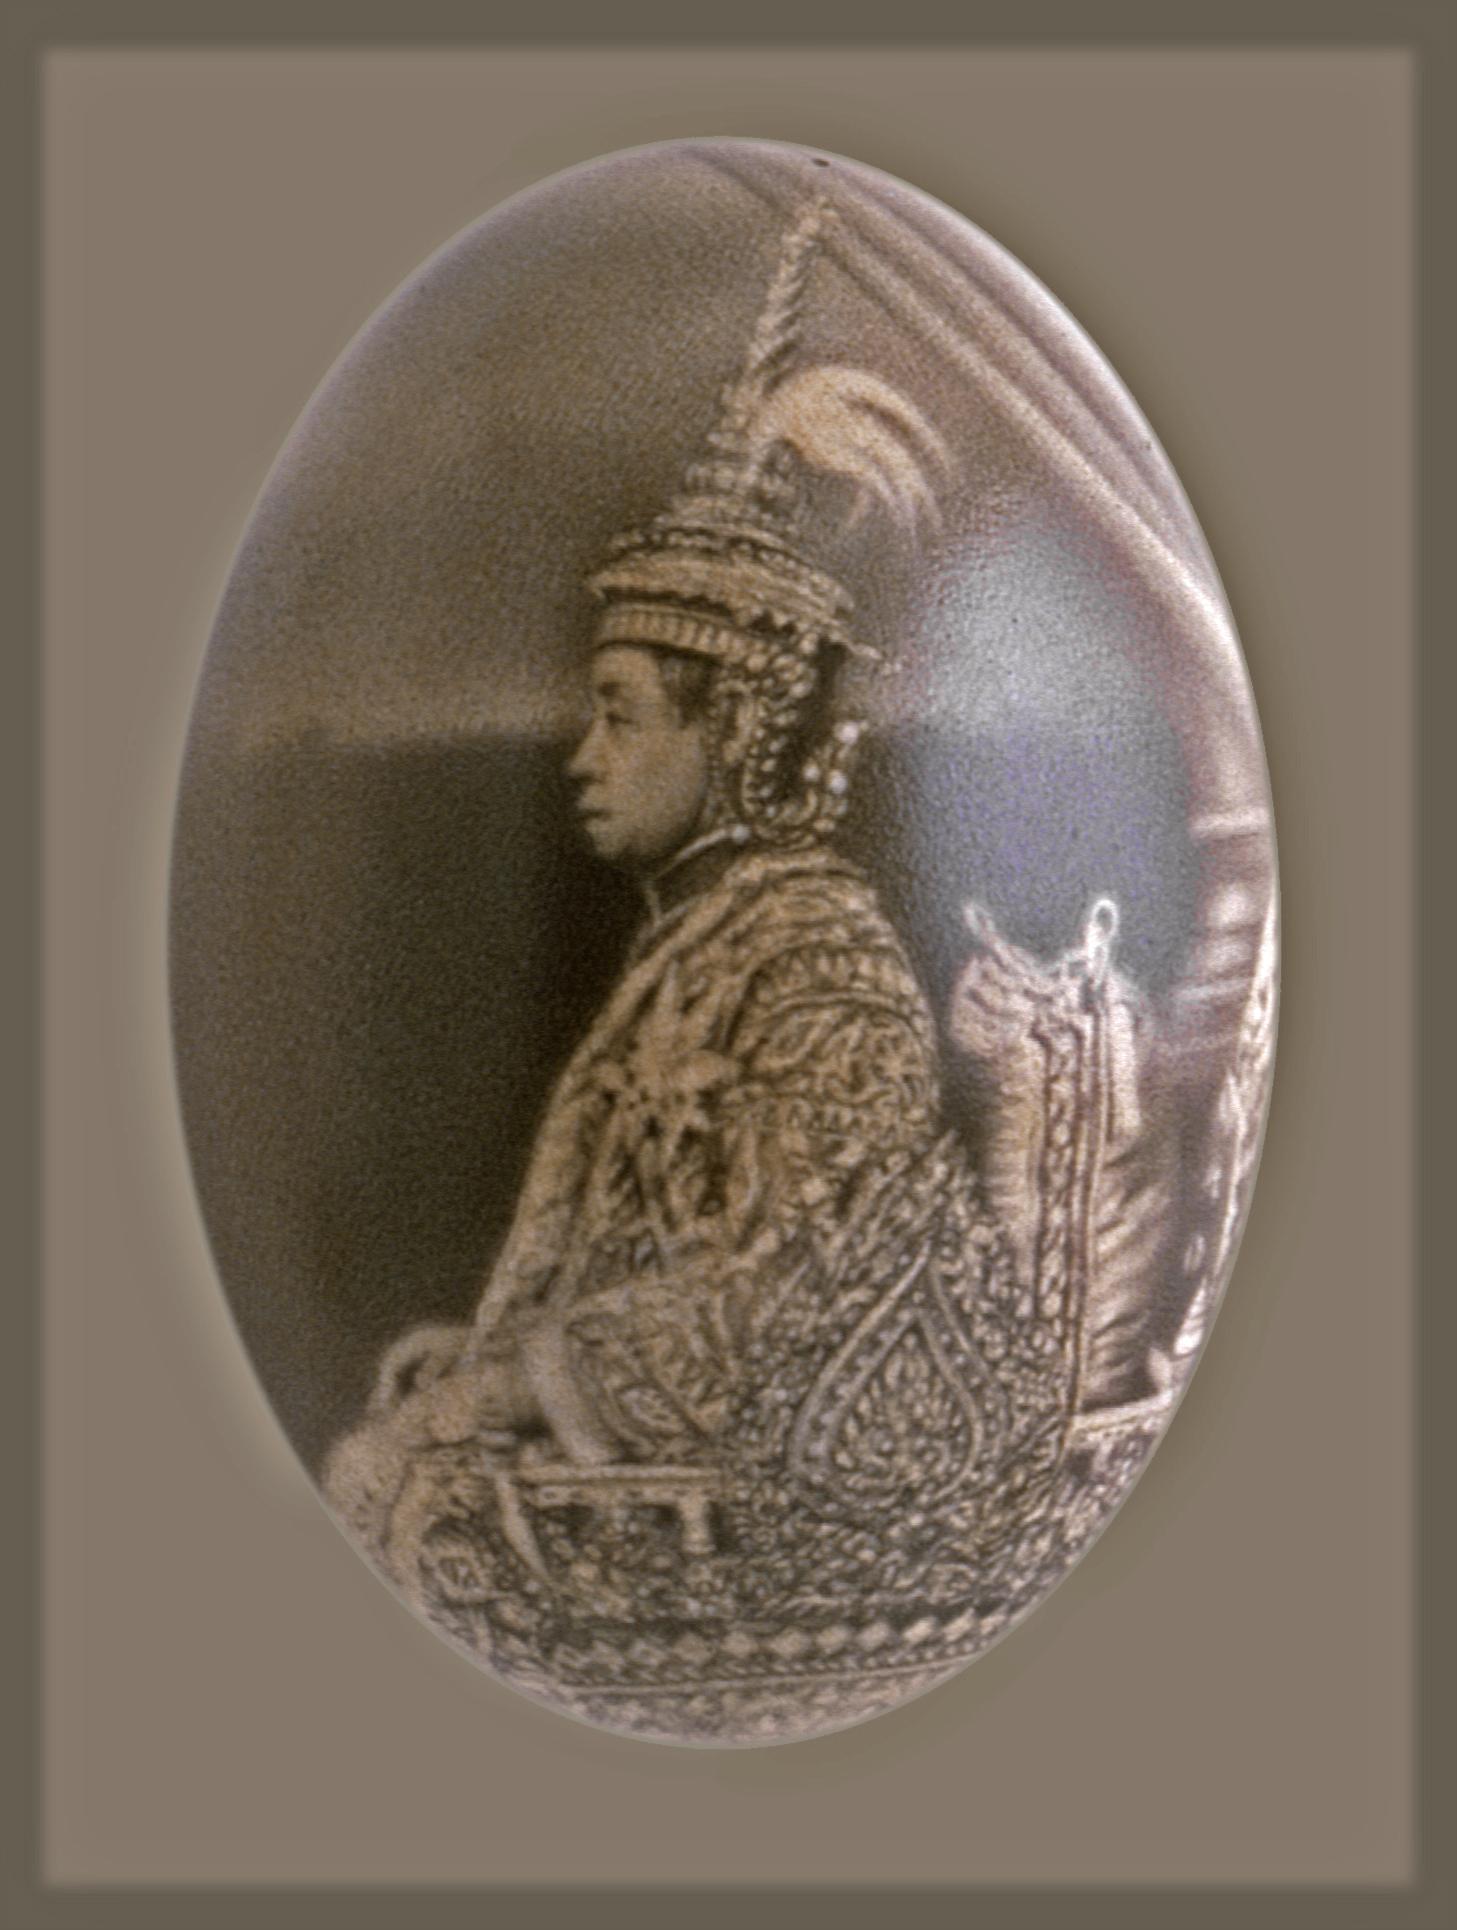 Thailand's King Rama VI